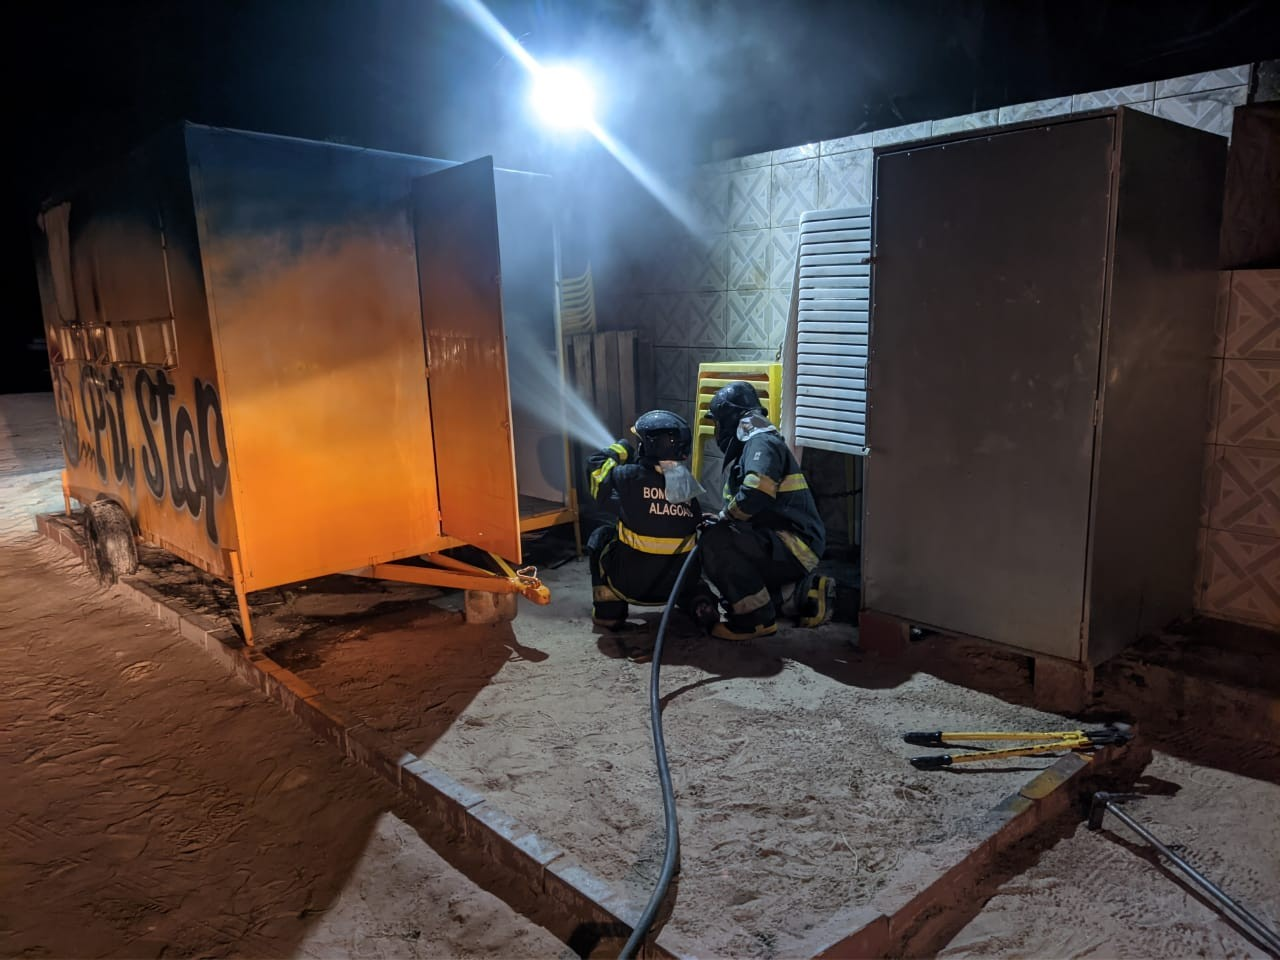 Trailer de lanches pega fogo na Praia Barra Grande, em Maragogi, Alagoas